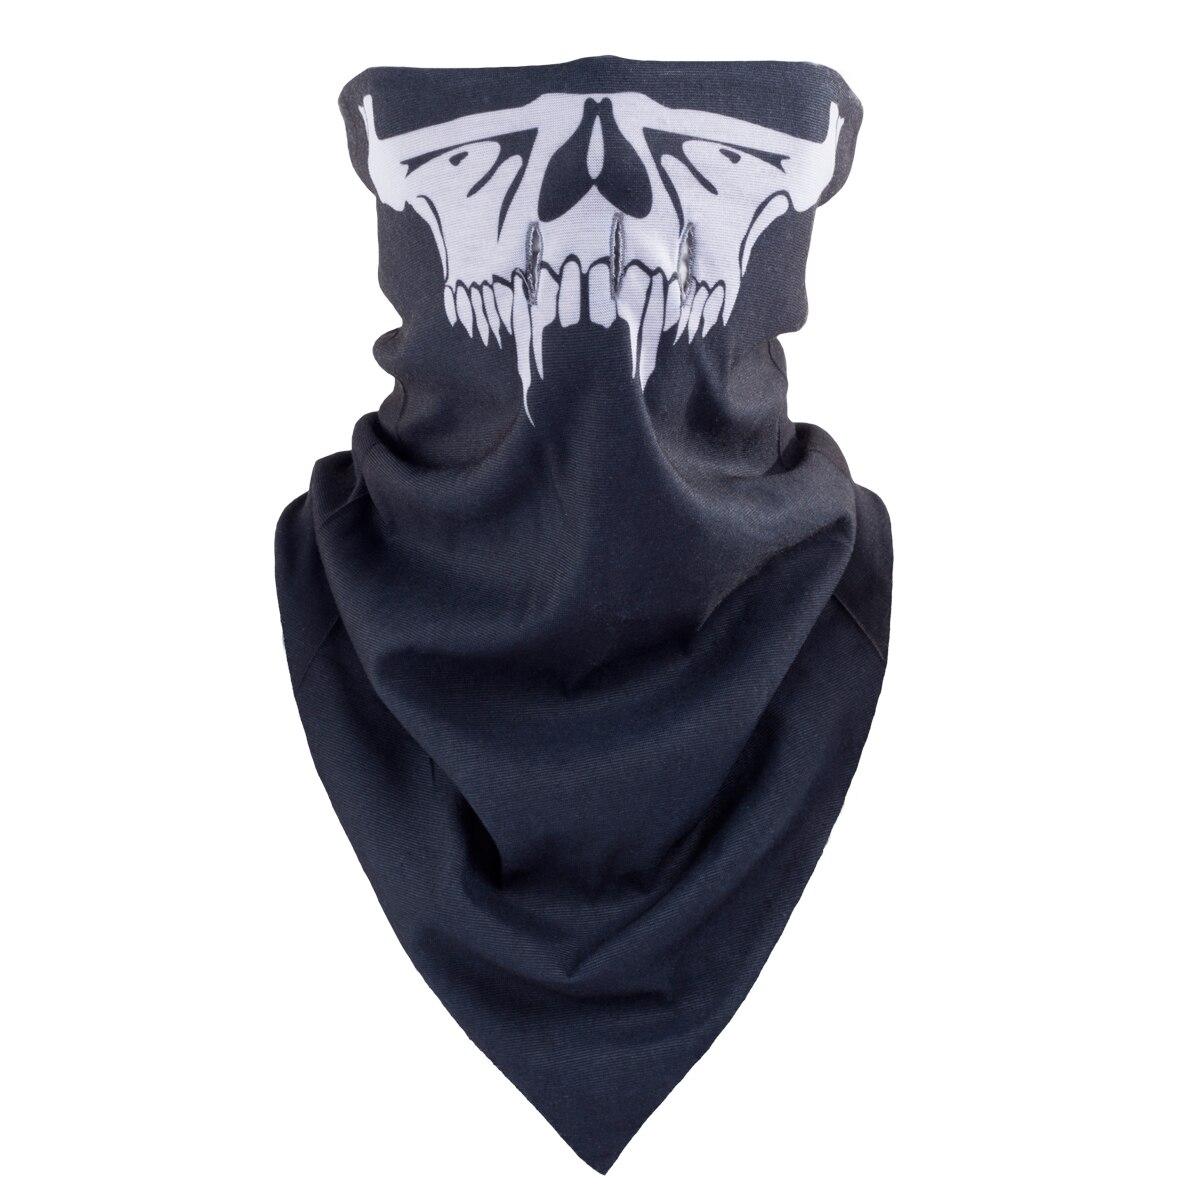 Online Get Cheap Skull Face Ski Mask -Aliexpress.com | Alibaba Group